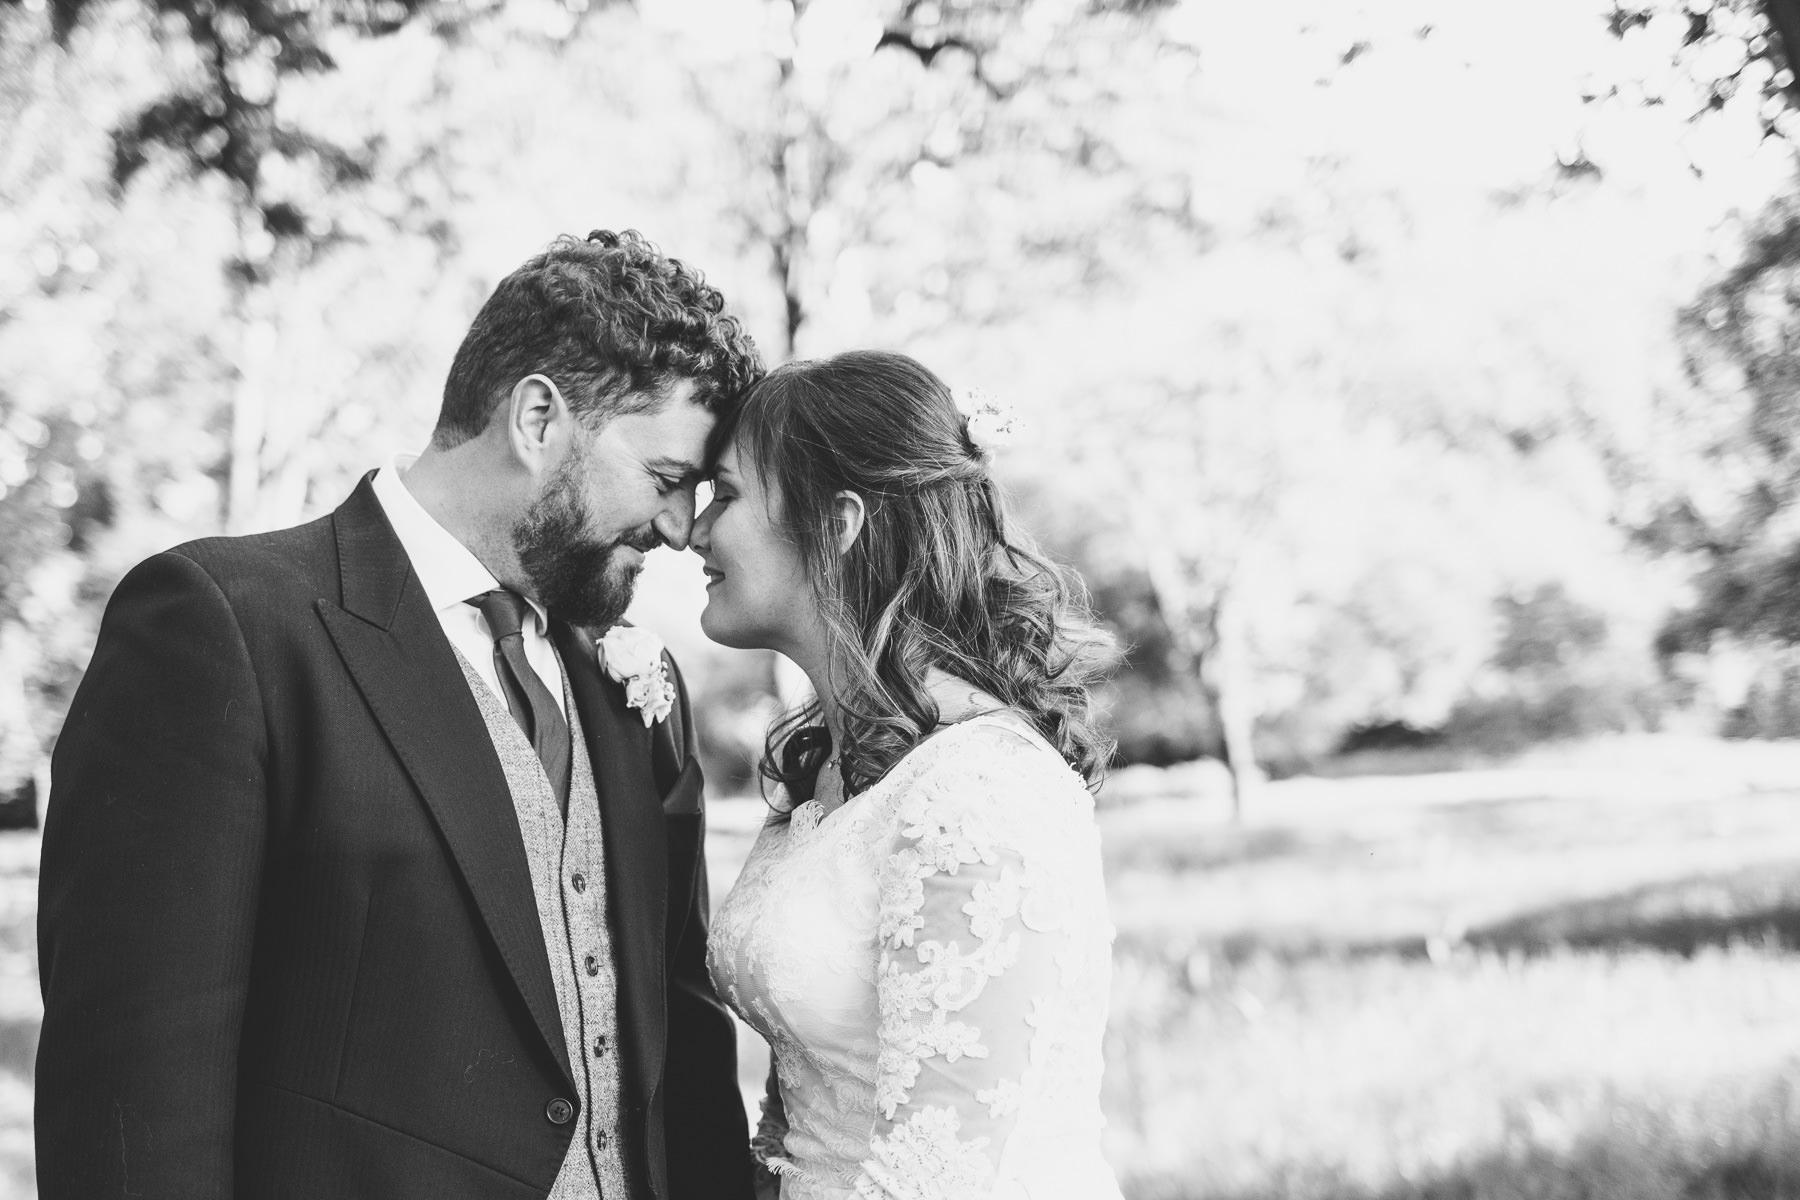 Pamber-Place-wedding-photography-basingstoke-hampshire-188